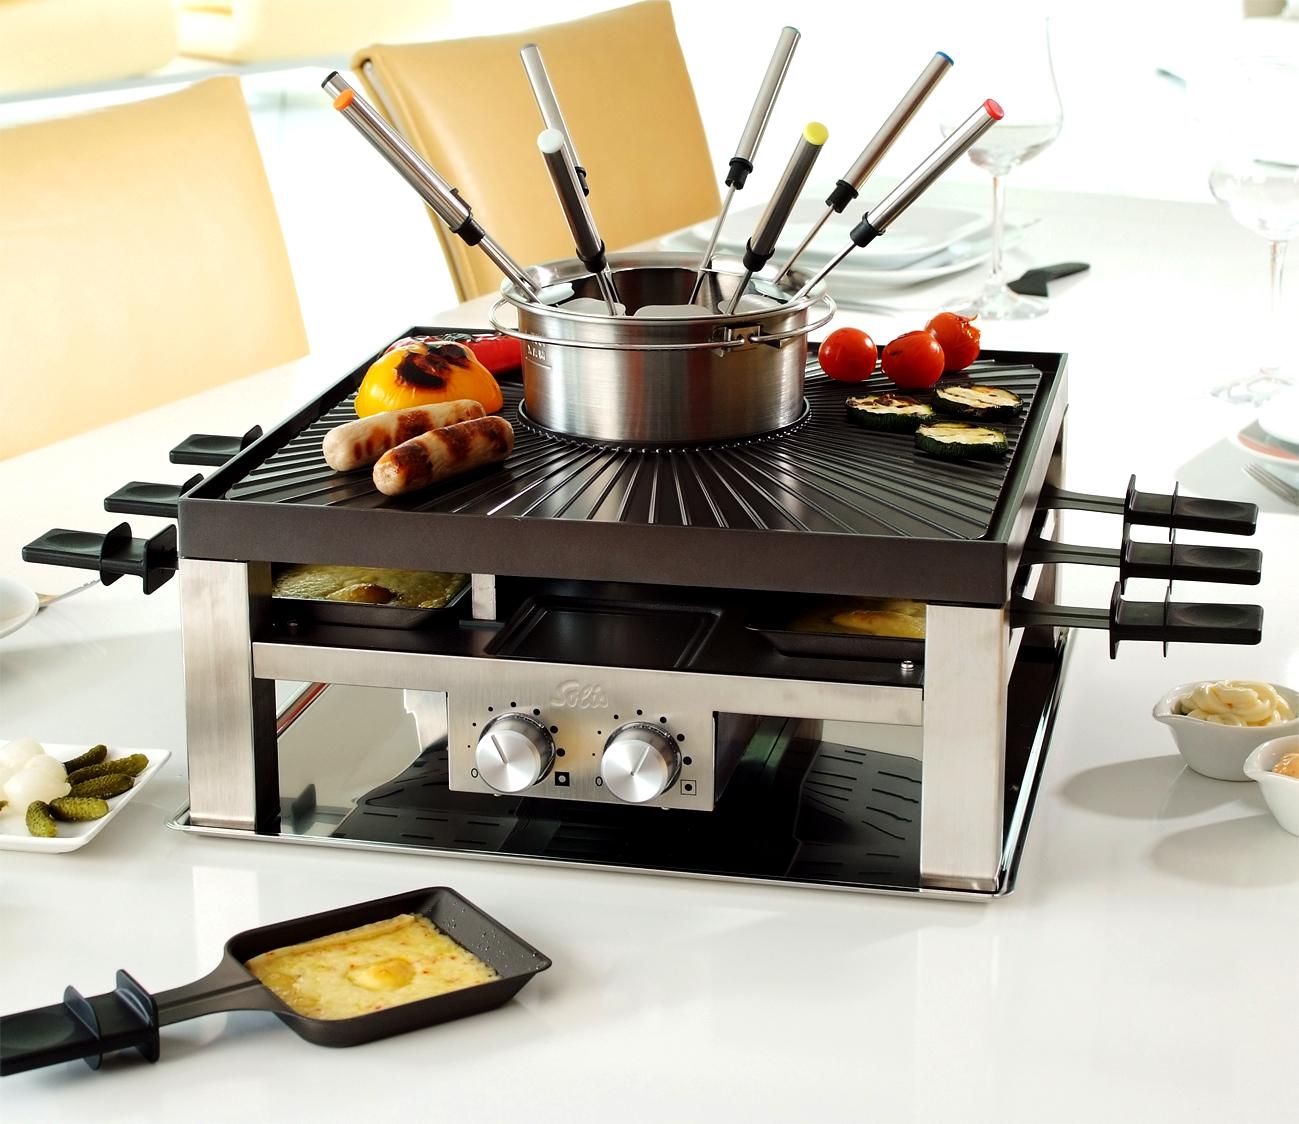 solis combi grill 3 in 1 fondue tischgrill raclette in einem. Black Bedroom Furniture Sets. Home Design Ideas